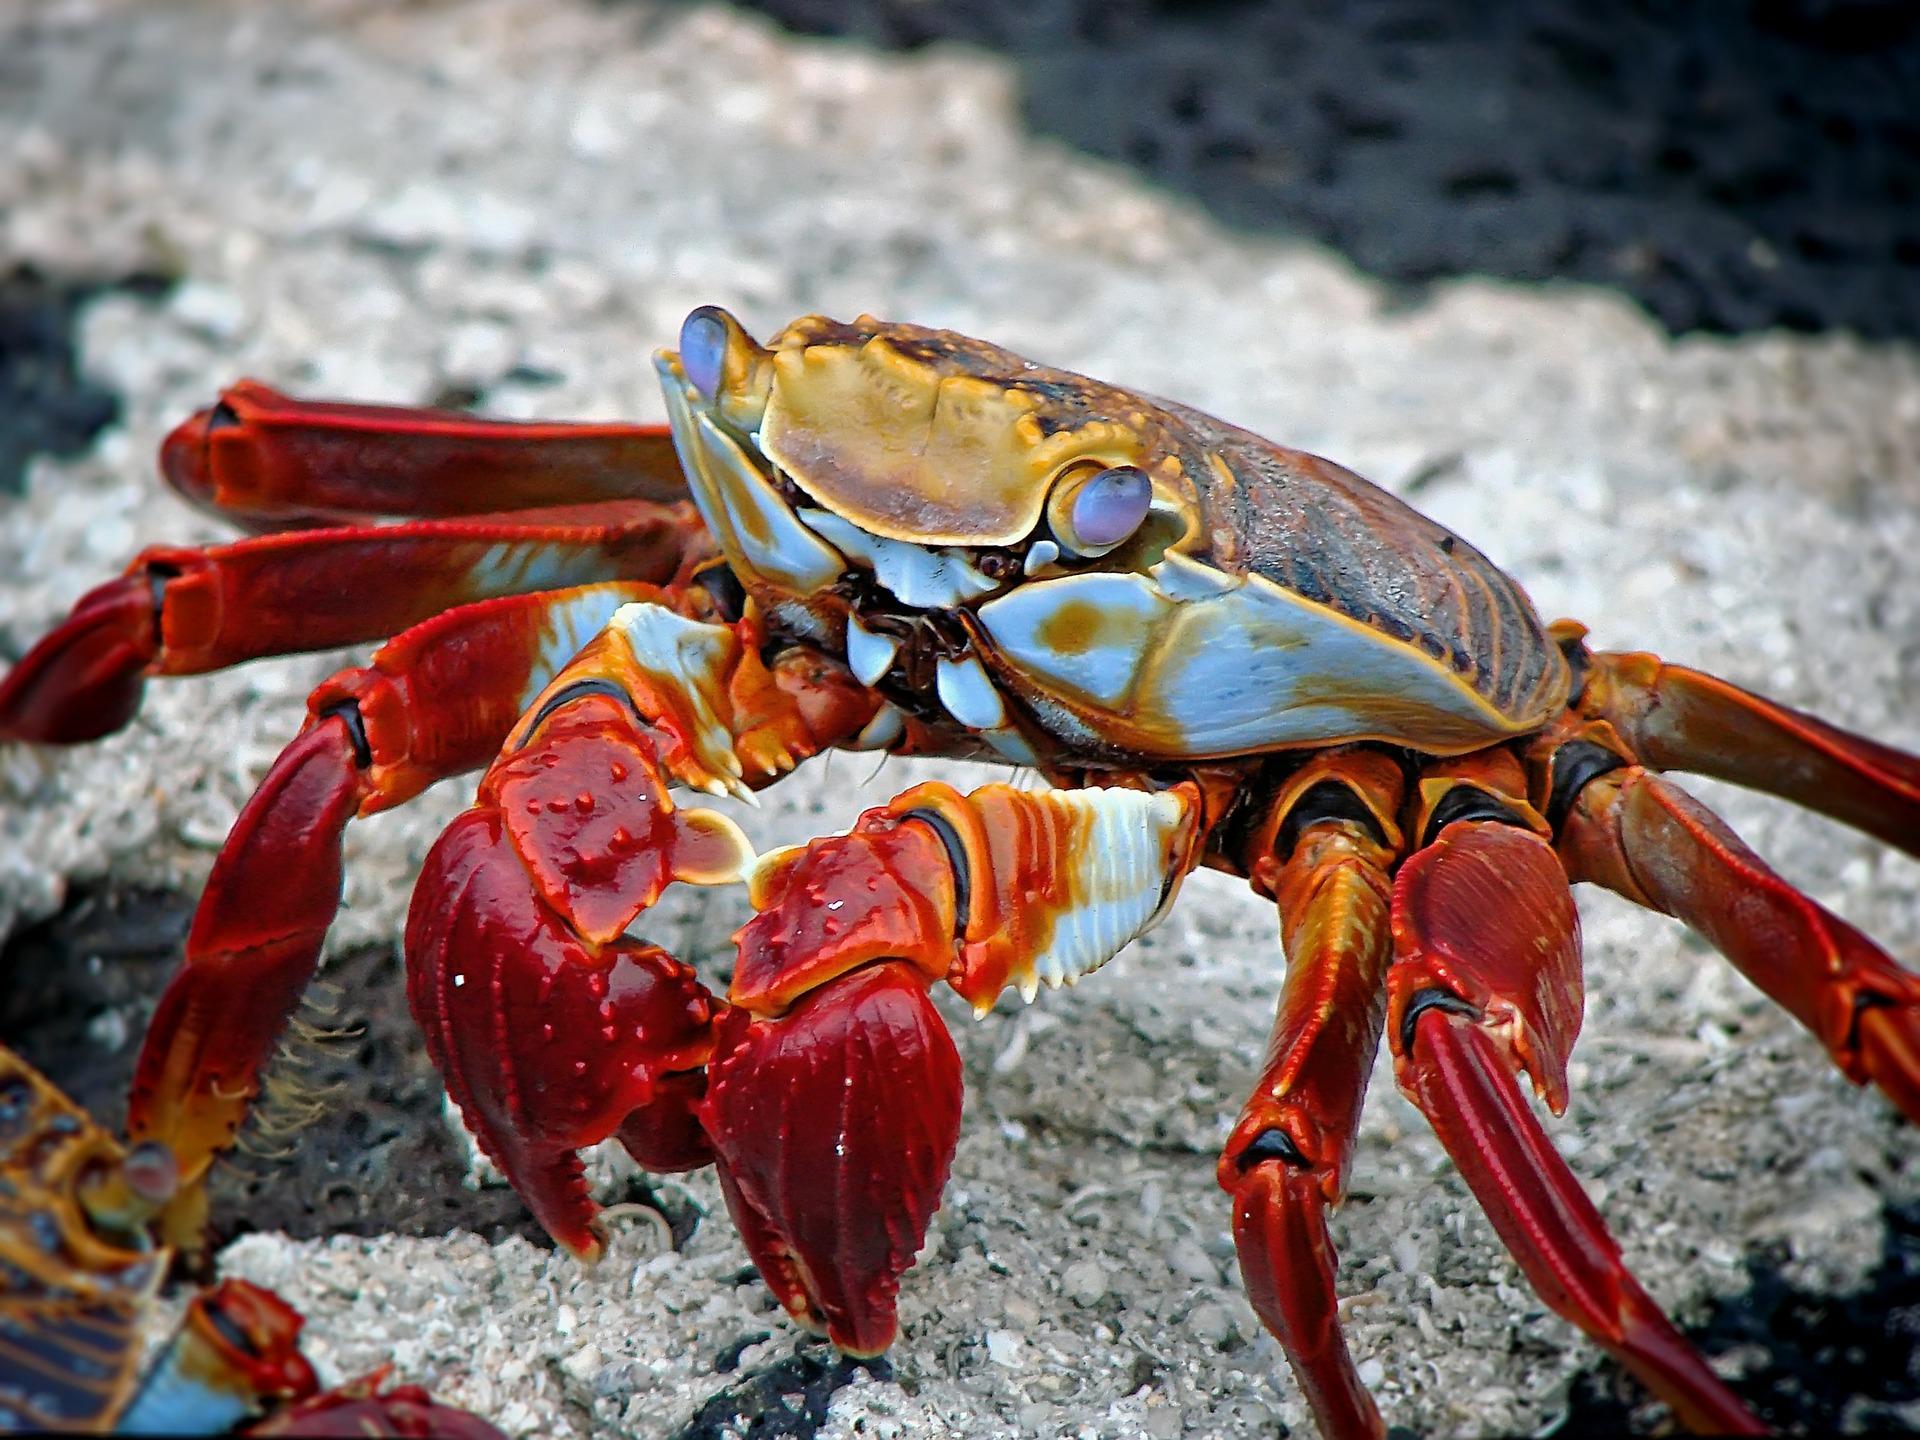 crab-298346_1920.jpg